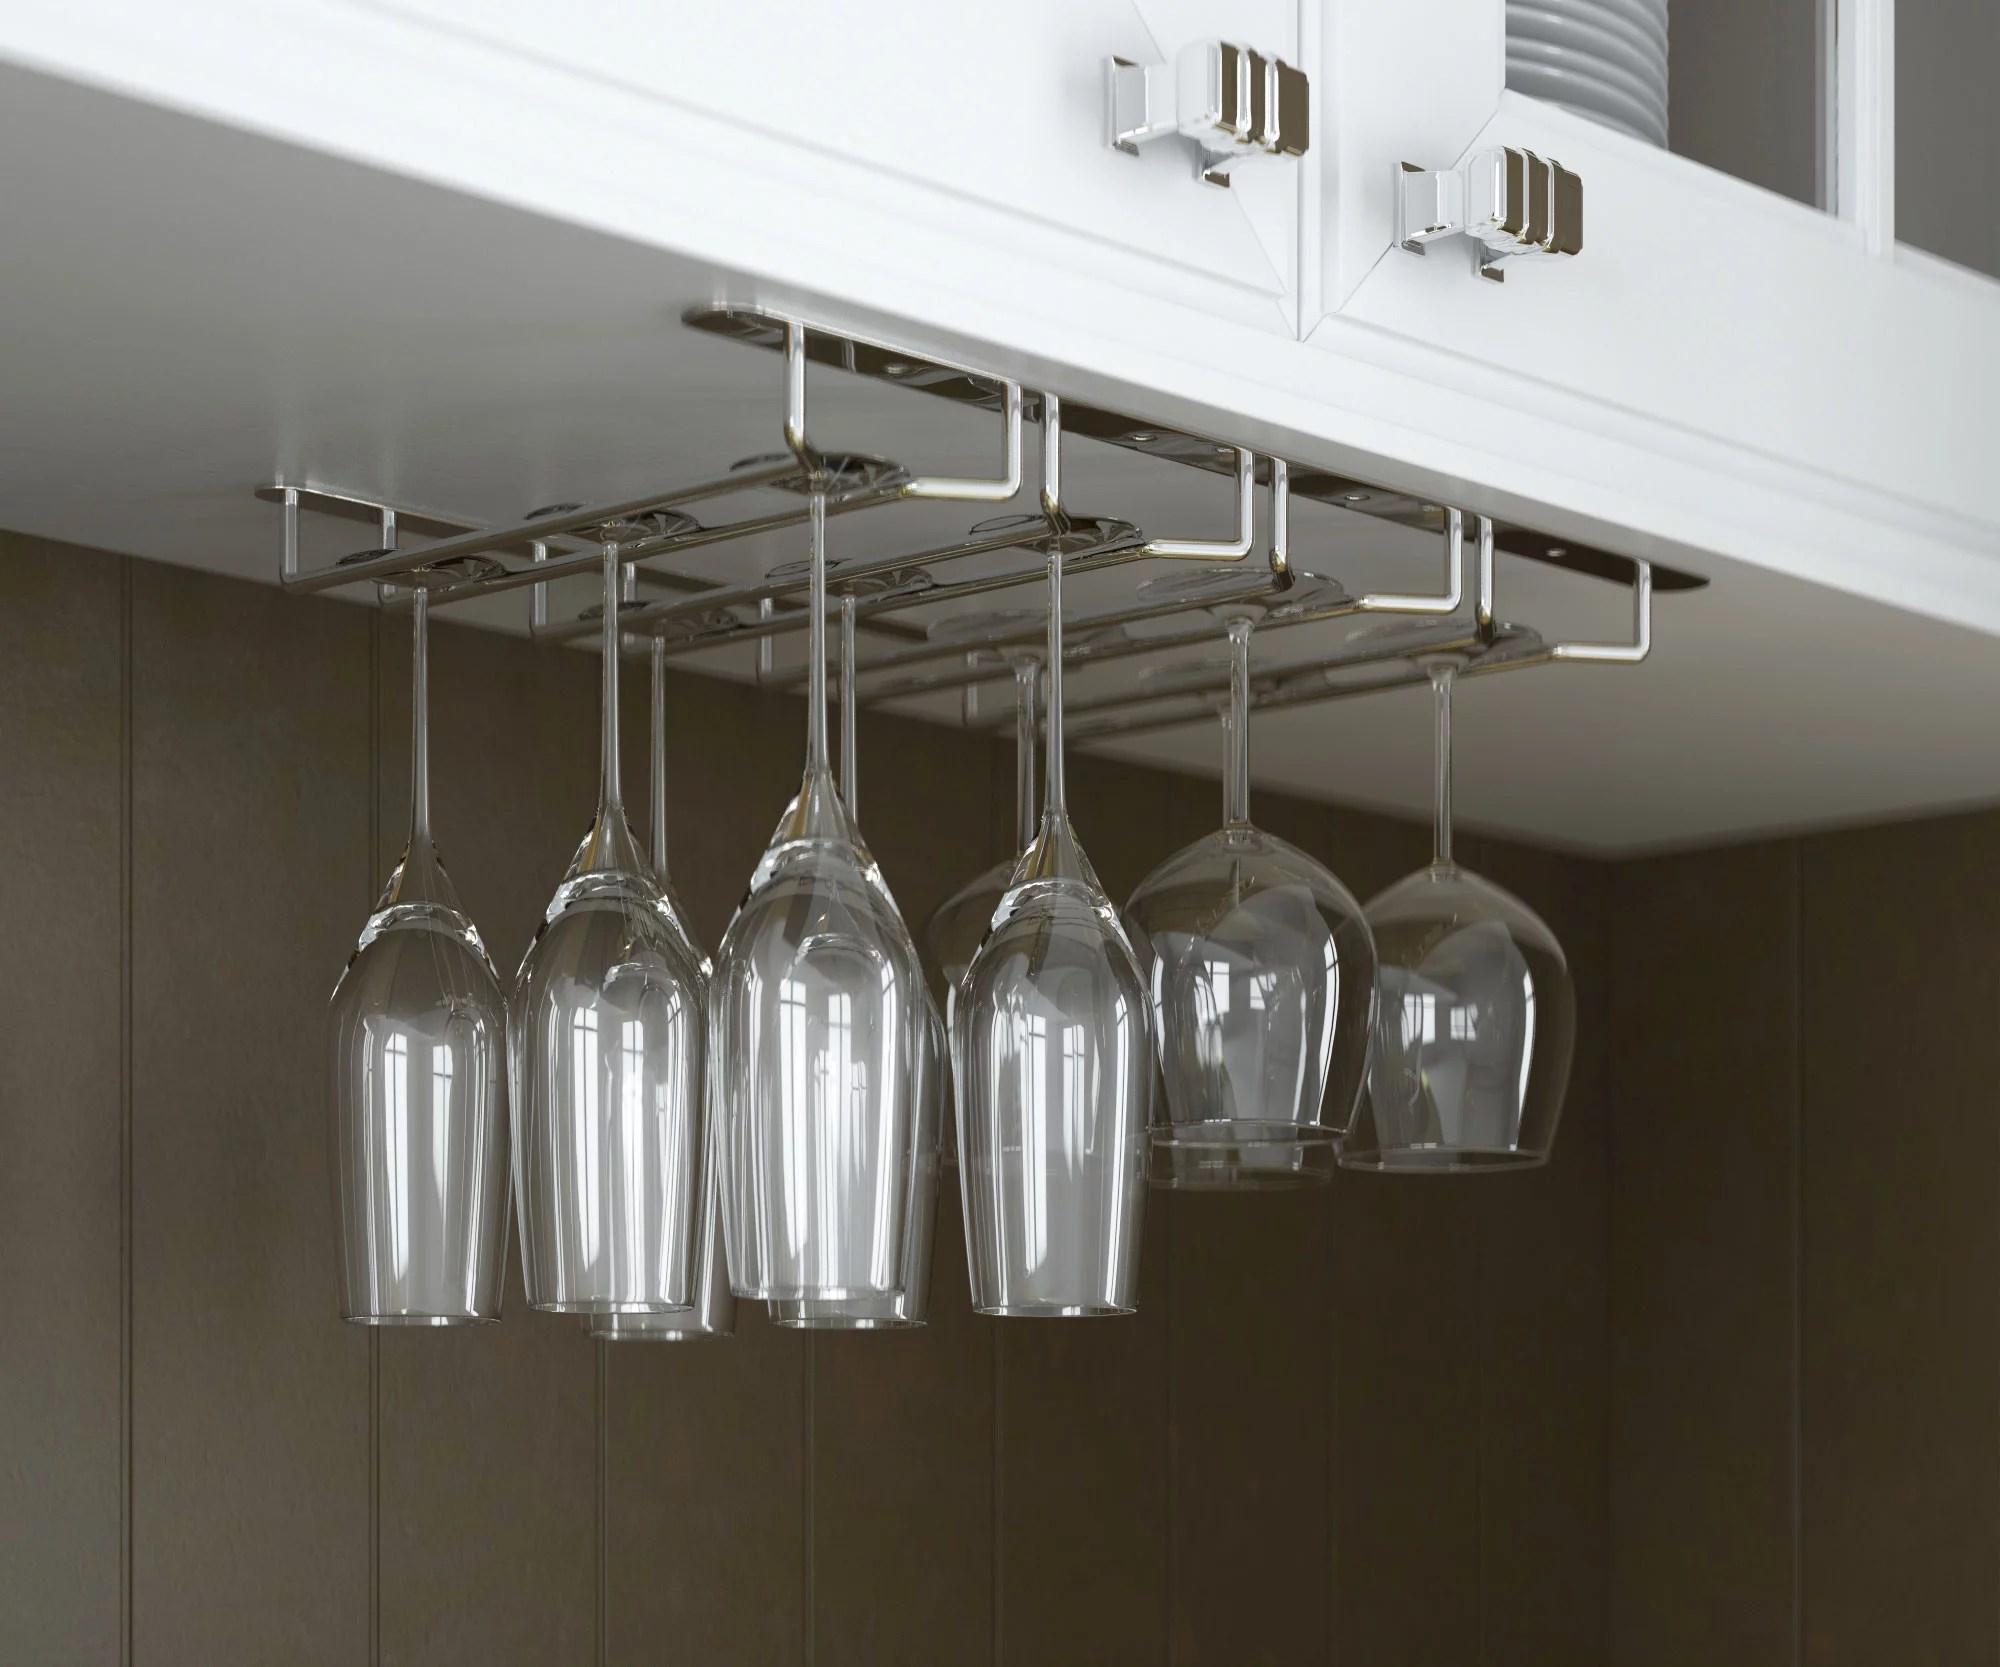 wallniture stemware glass rack wine glasses under cabinet chrome finish walmart com